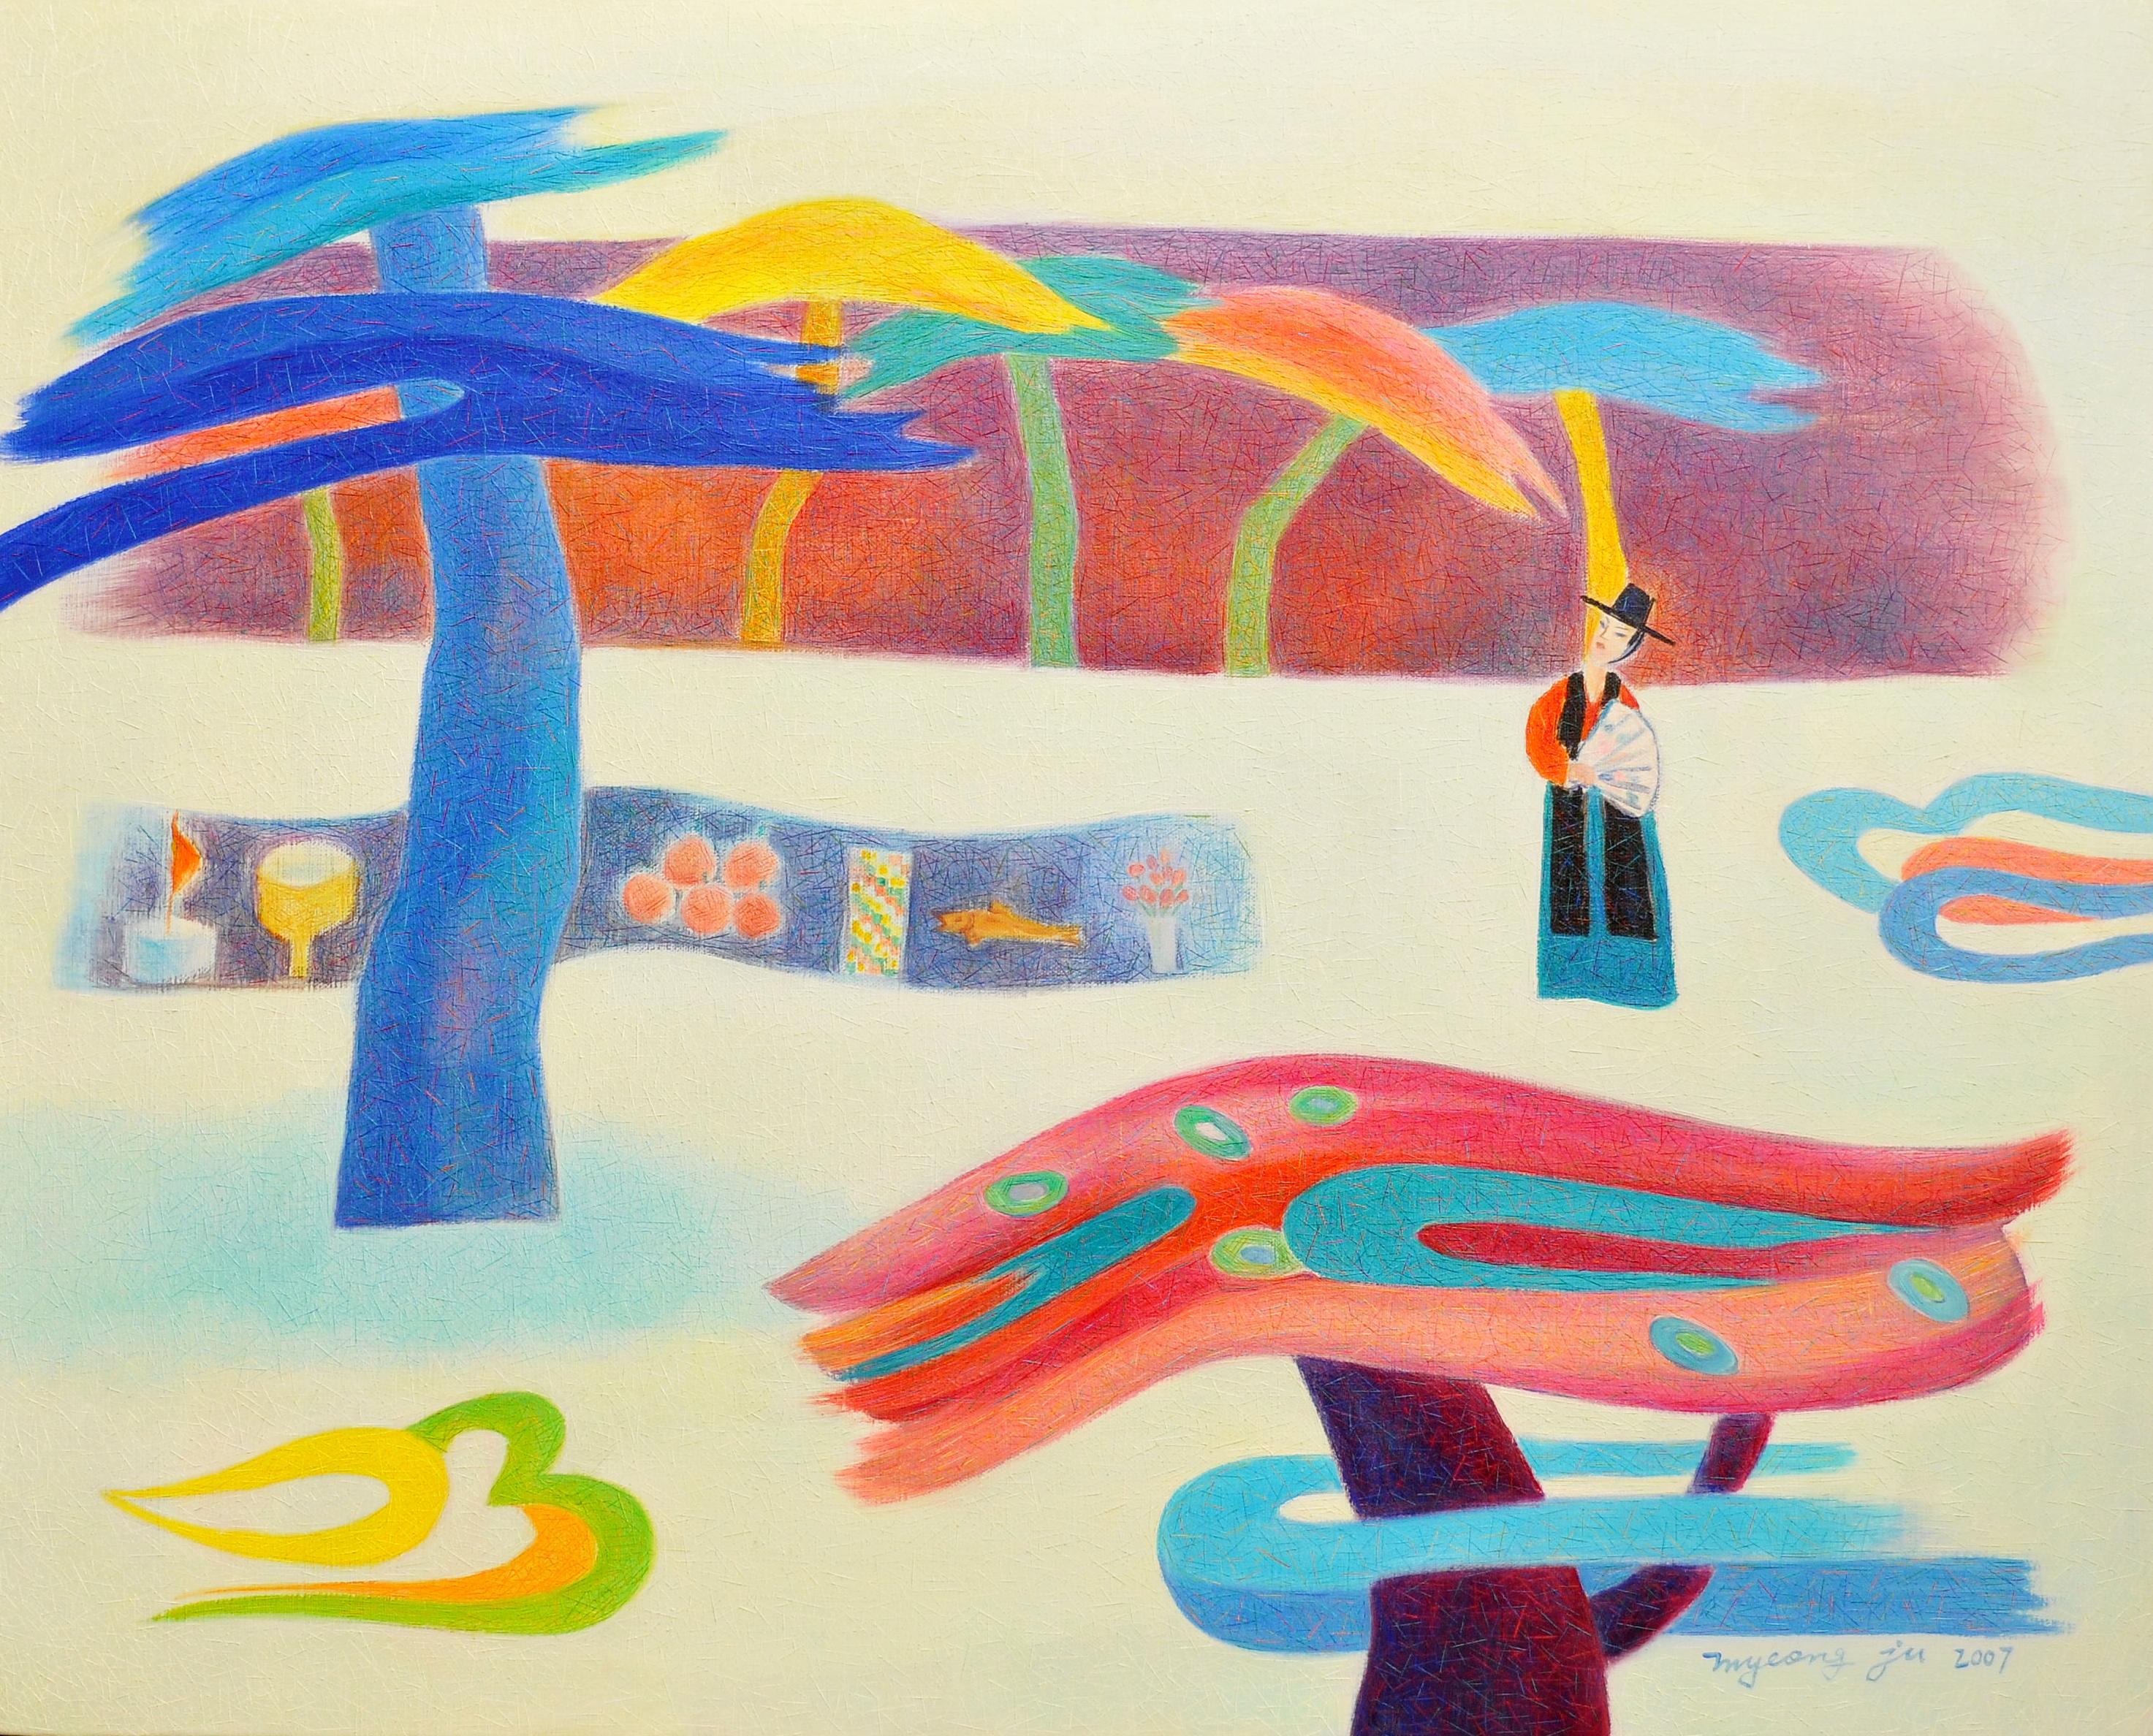 shamanism -그 기억속에 내가 있었네 90.9×72.7cm oil on canvas 2007